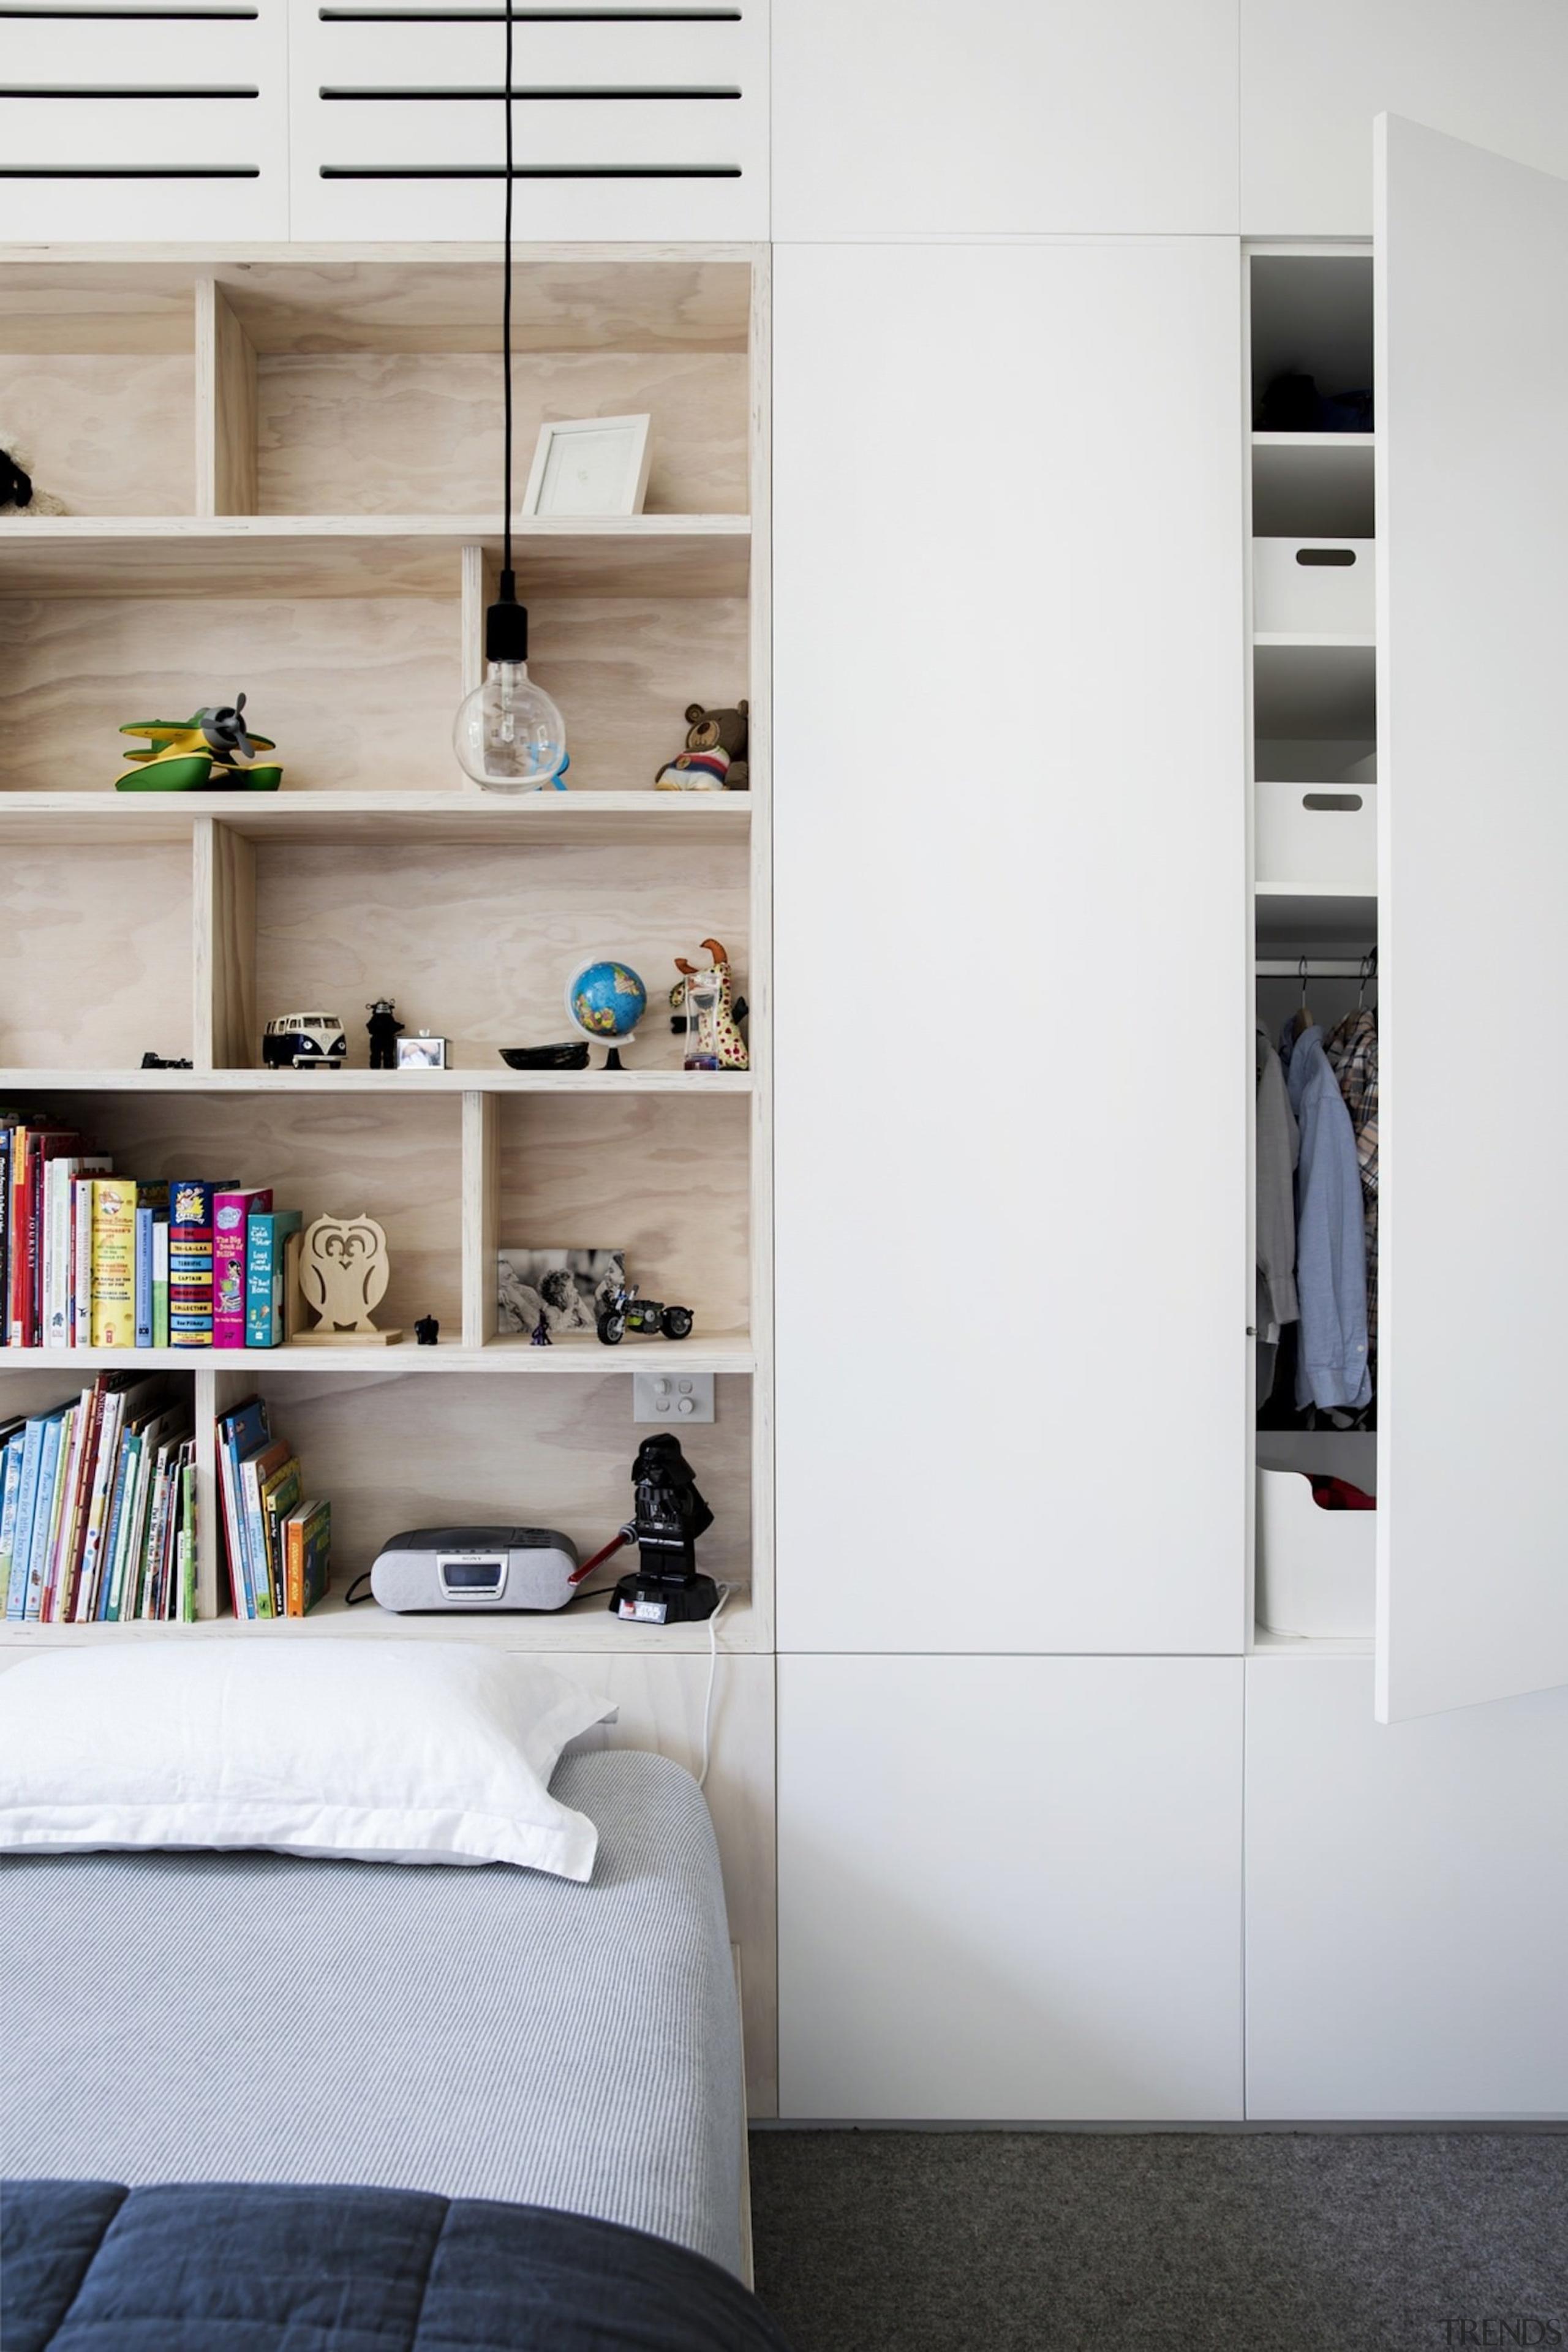 Architect: Architect PrineasPhotography by Chris Warnes closet, furniture, interior design, room, shelf, shelving, wall, wardrobe, white